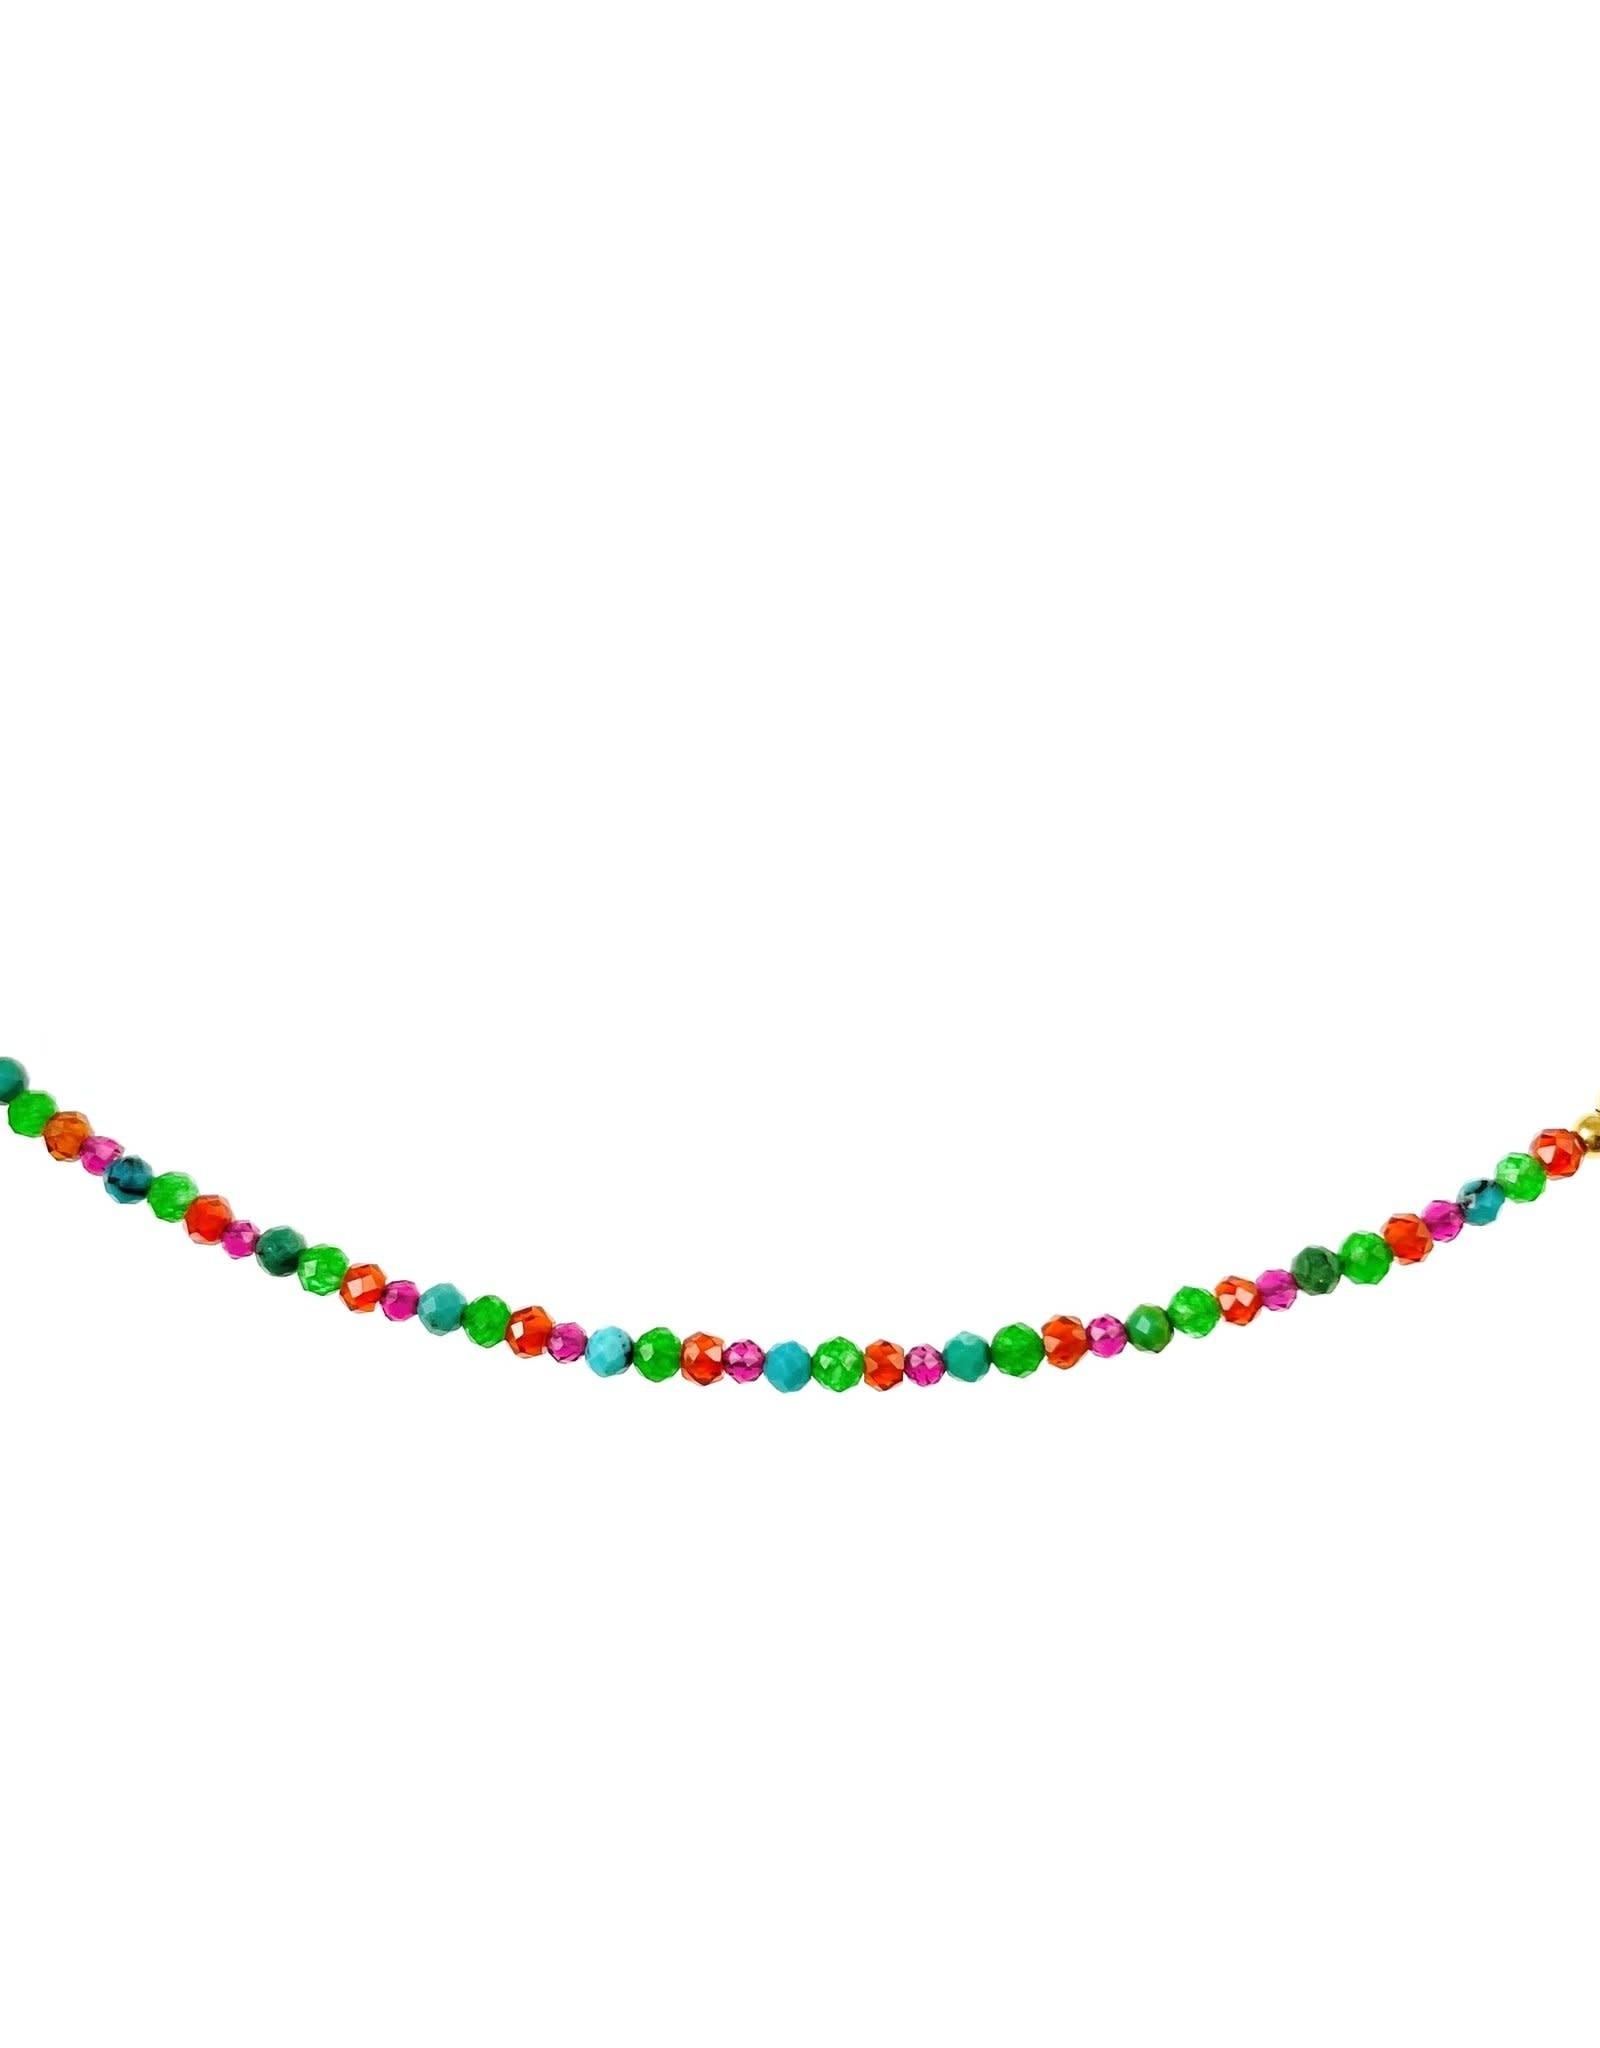 Collier 15'' - Perles de verre blanc